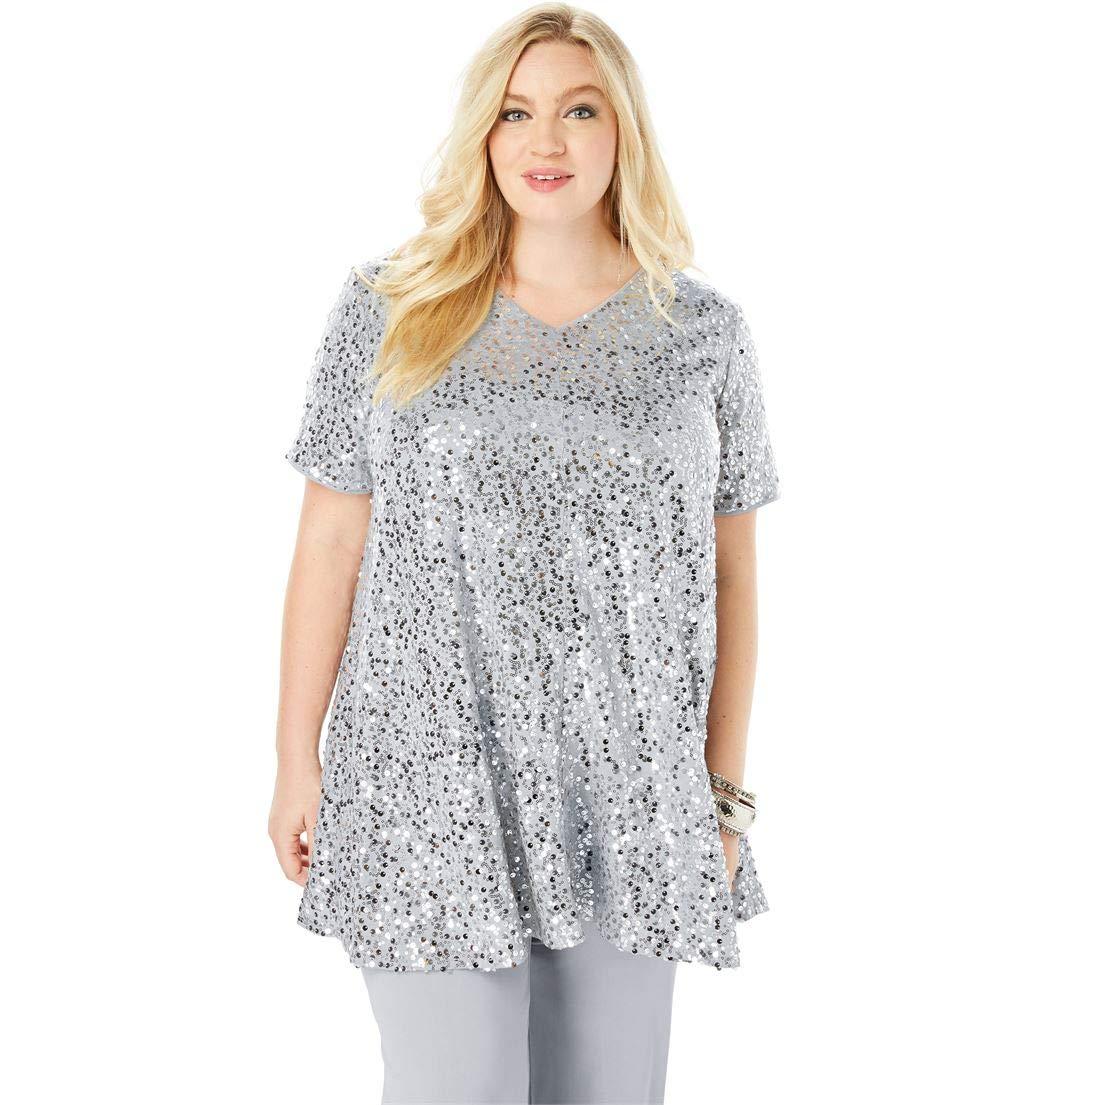 Roamans Women's Plus Size Trapeze Tunic & Pant Set with Sequin Embellishment - Silver Shimmer, 20 W